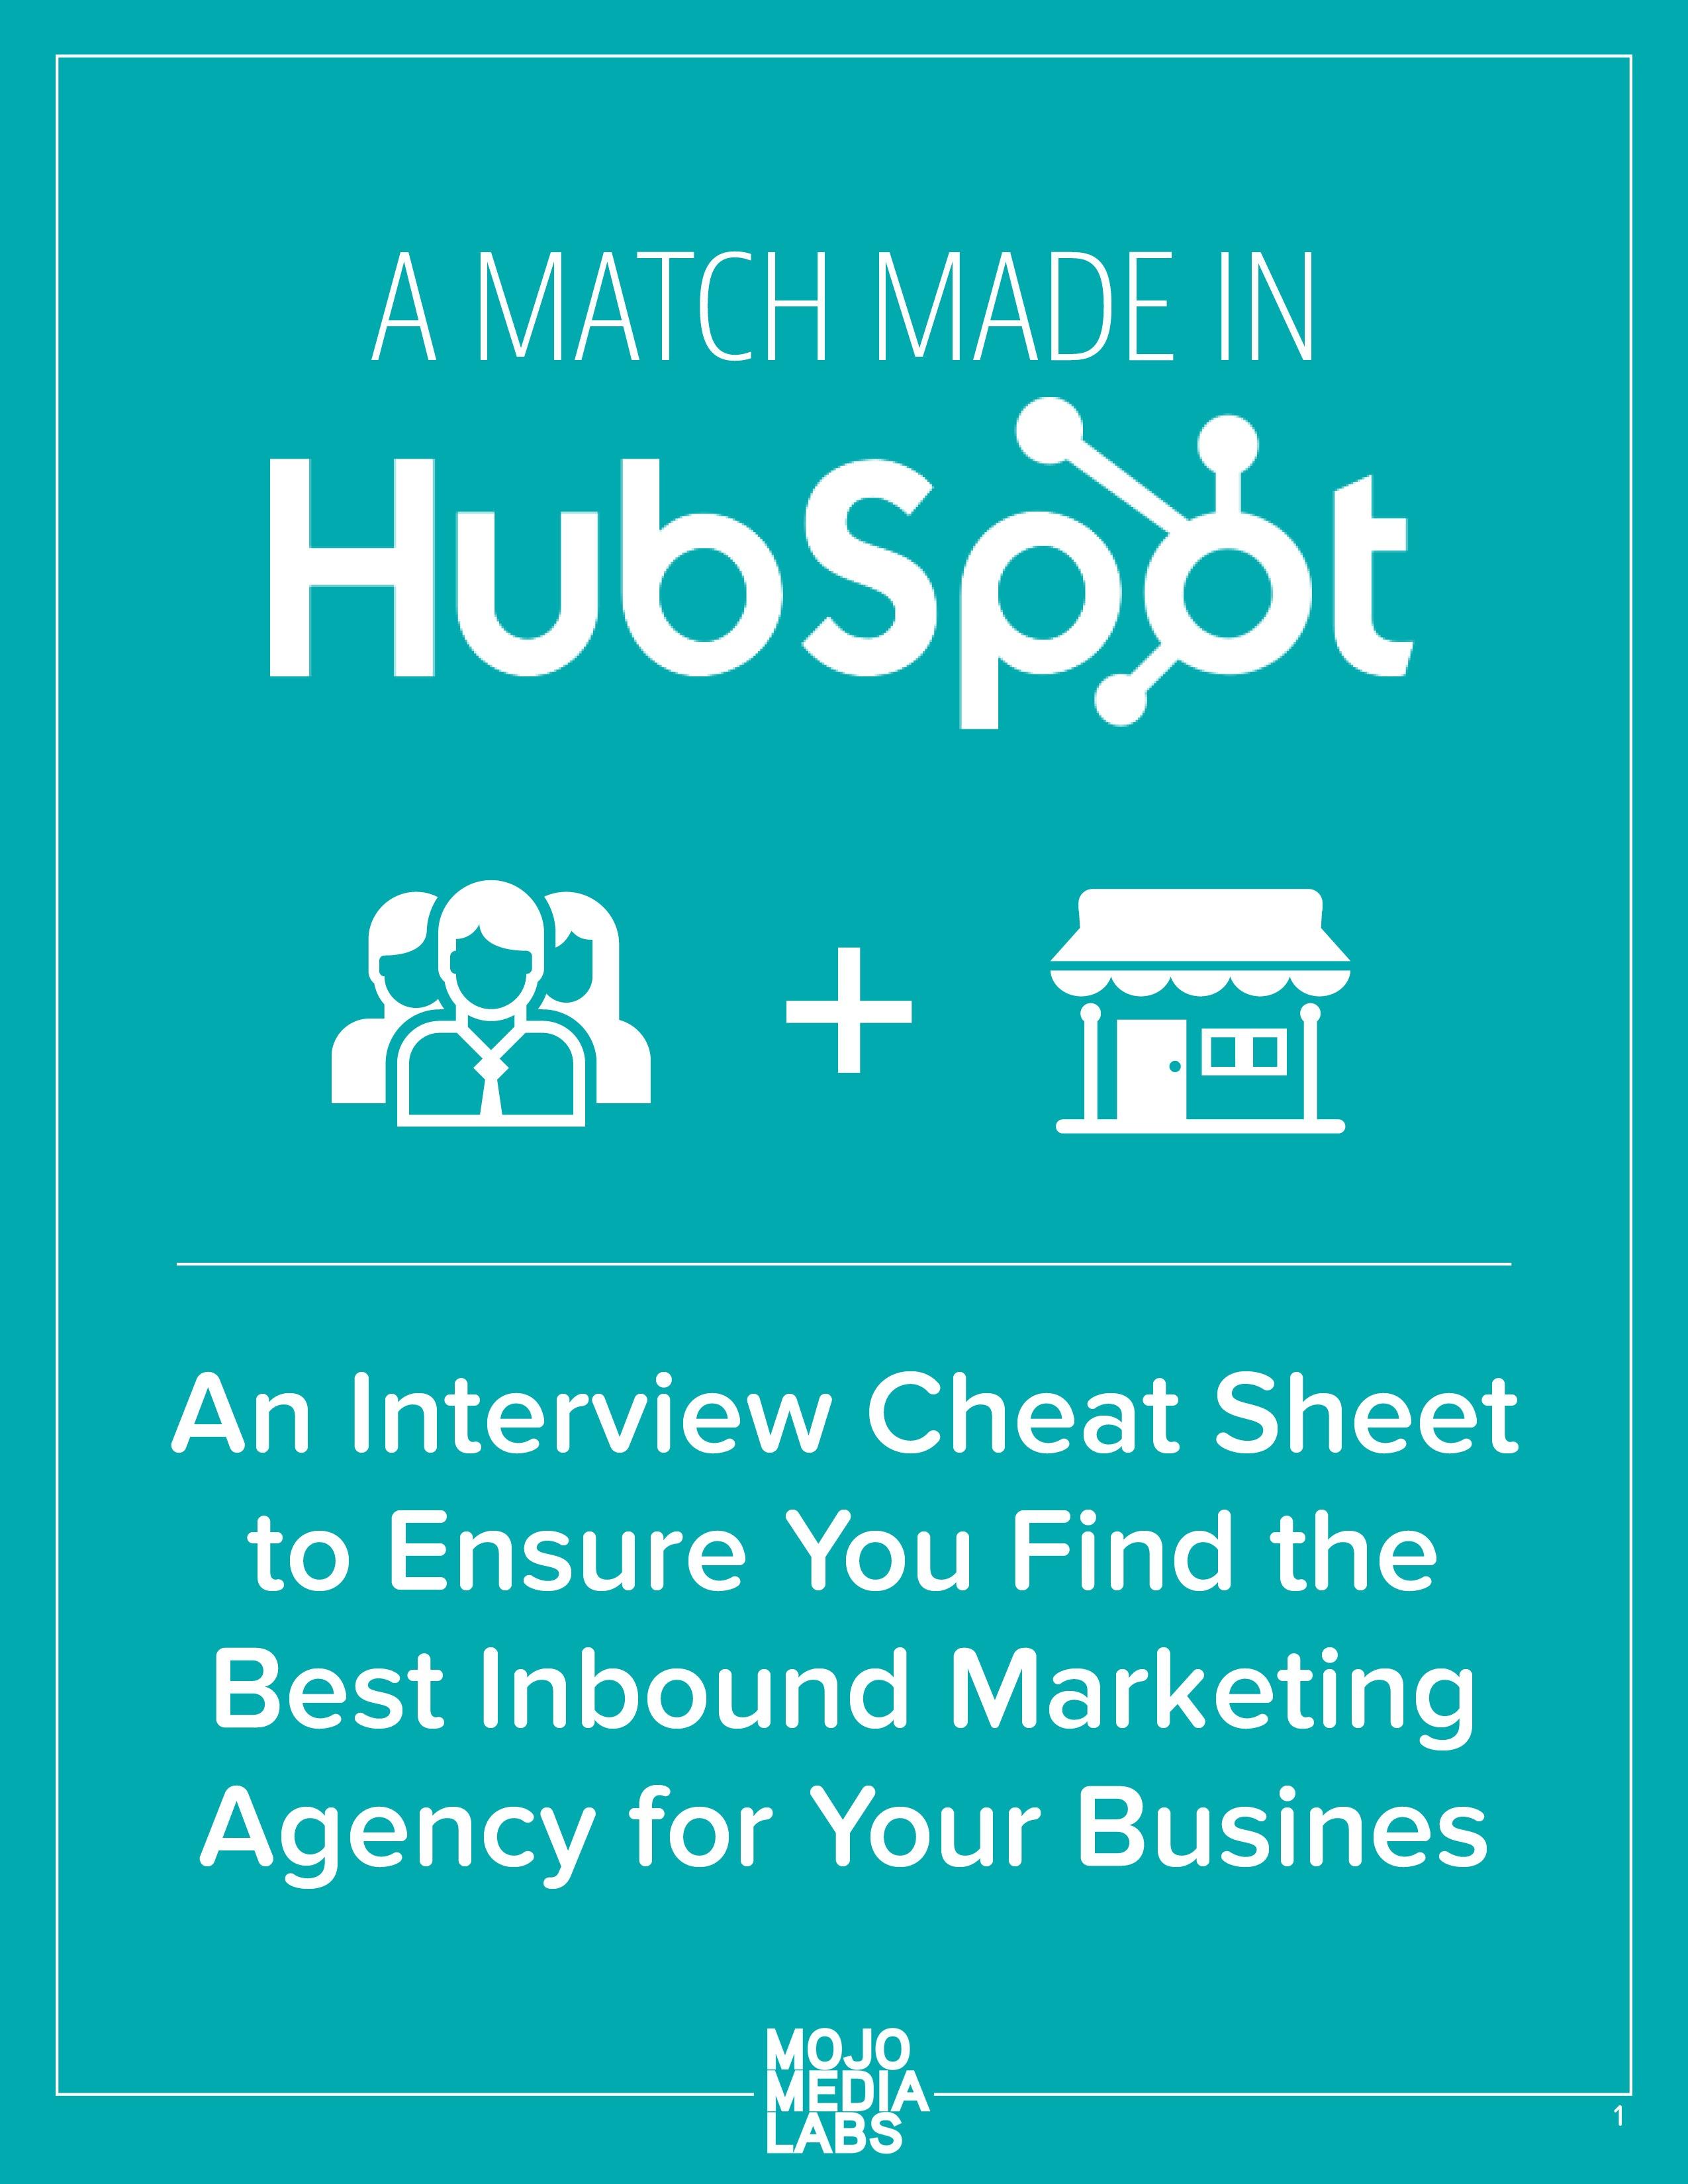 Mojo_MOFU DIY HS Agency Checklist-Cheat Sheet.jpg